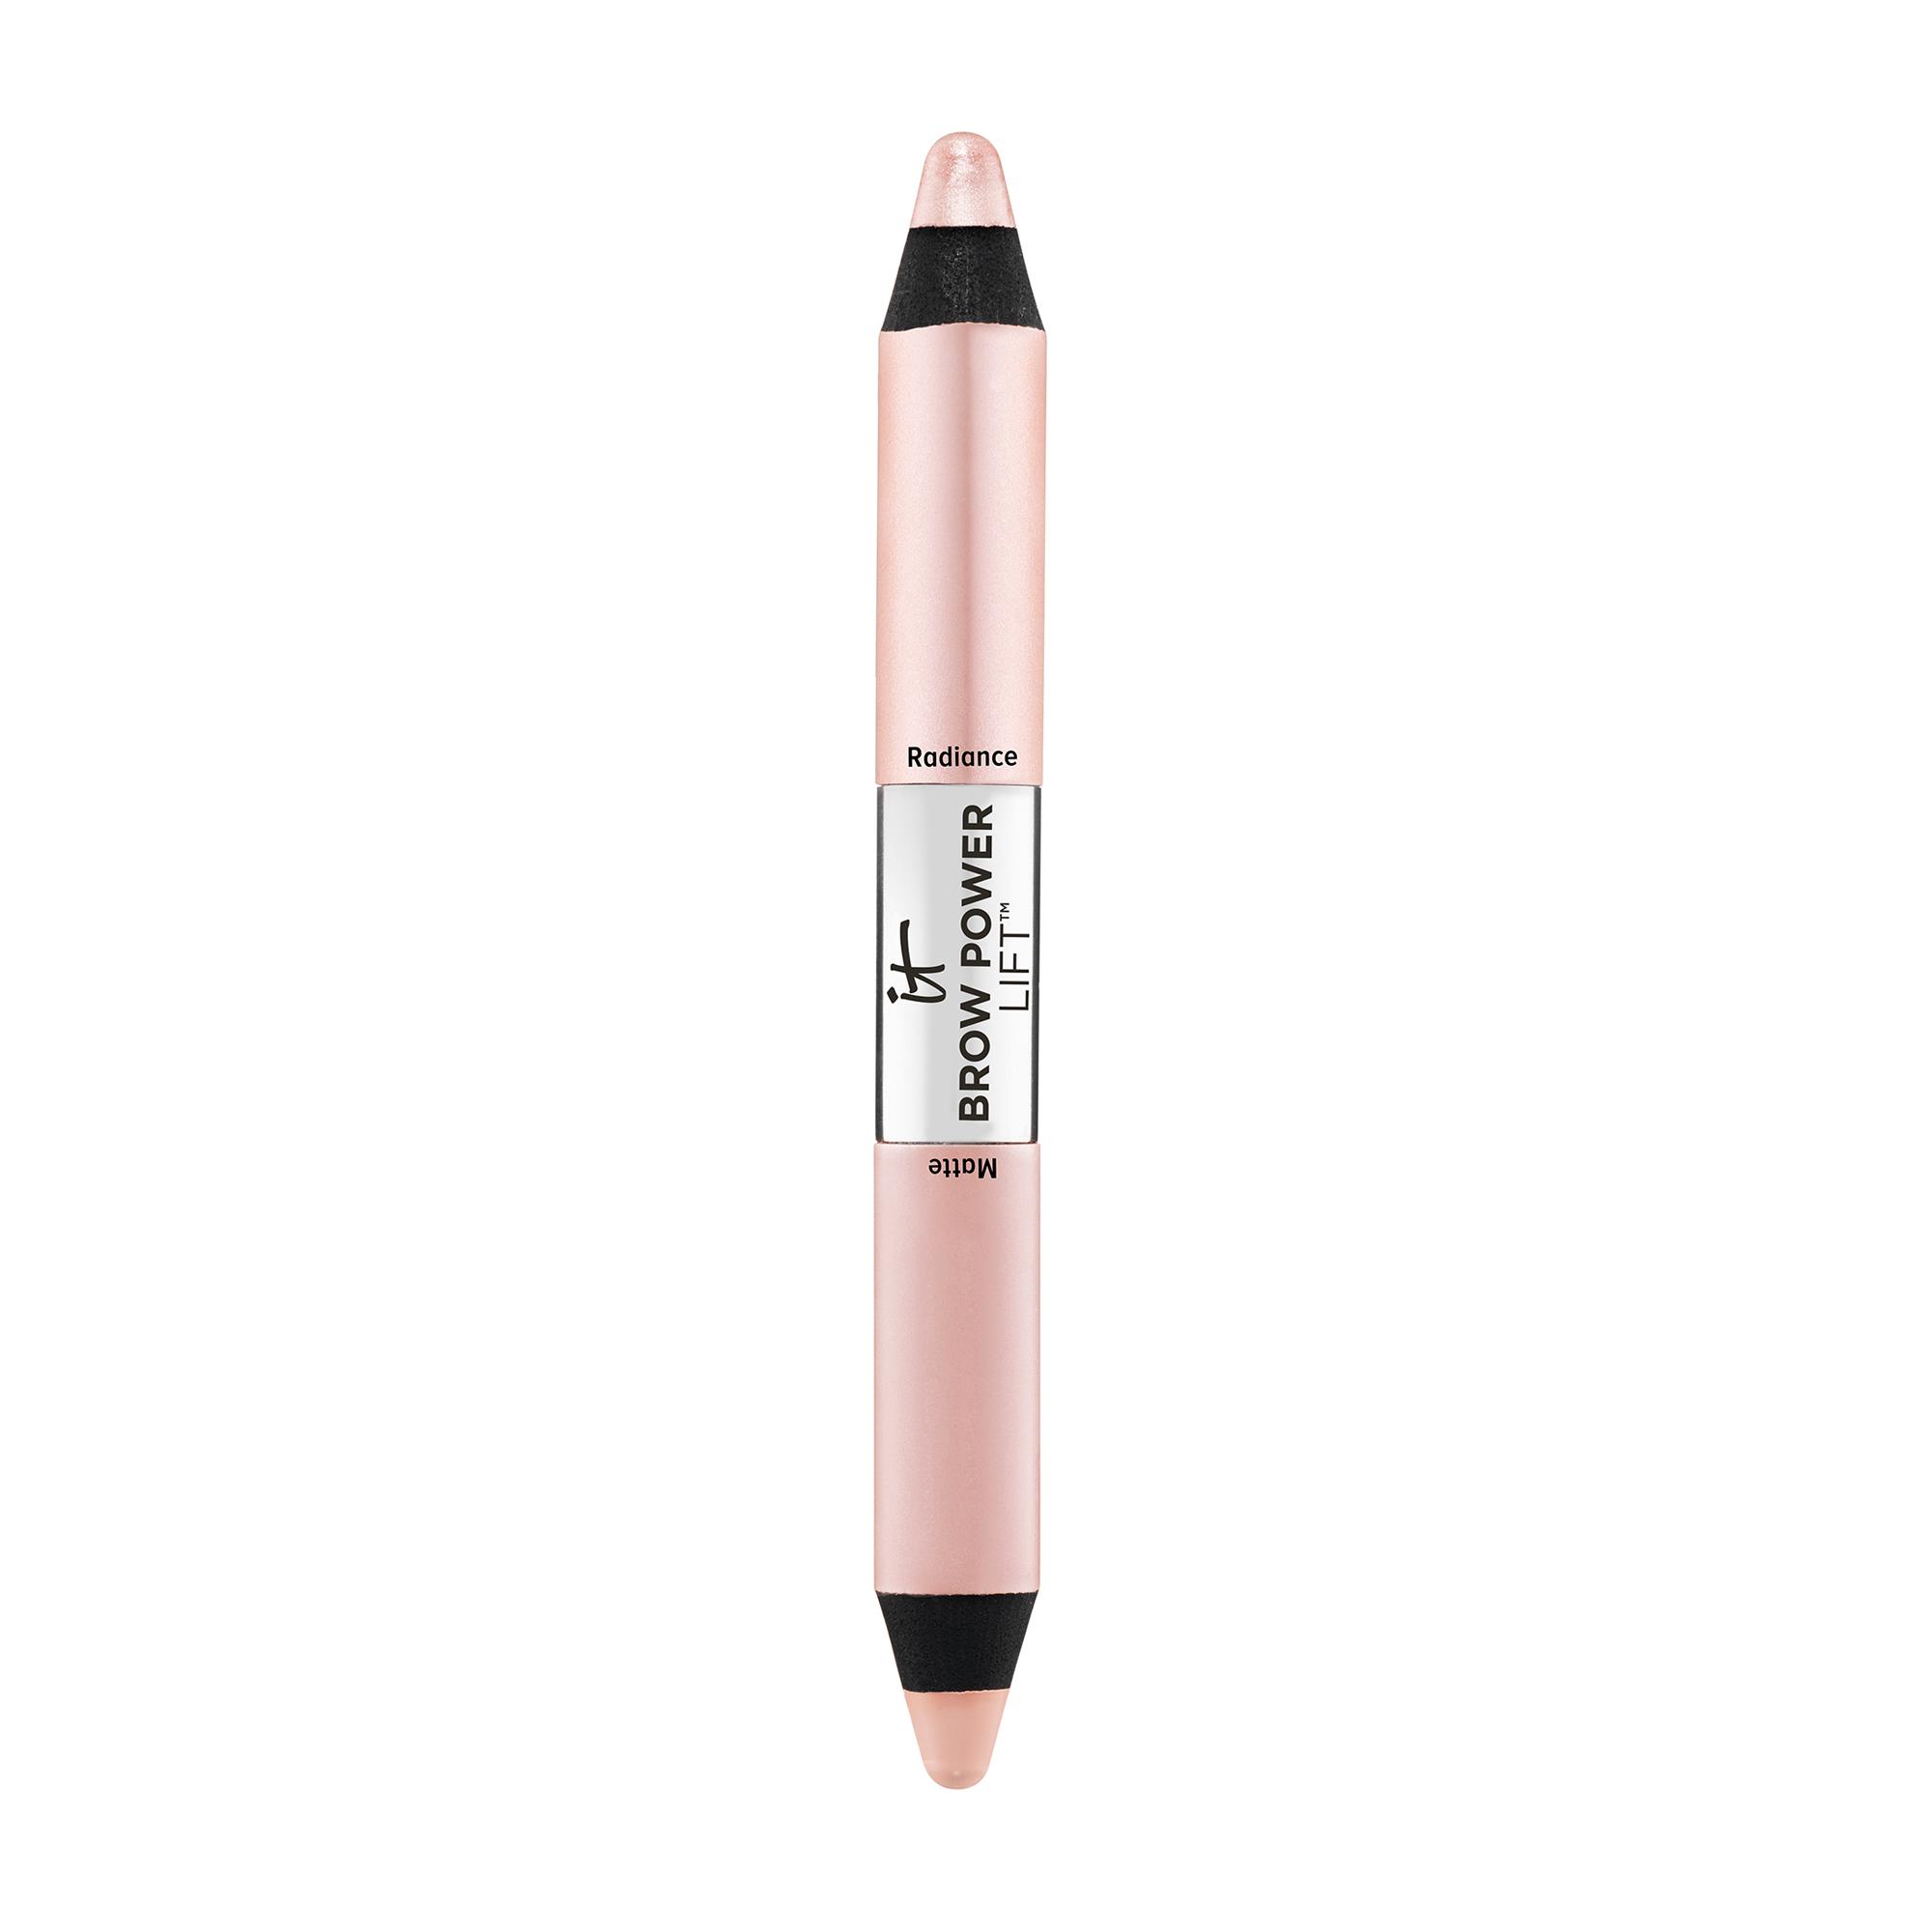 Brow Power Lift™ Highlighting Pencil Matte/Radiance